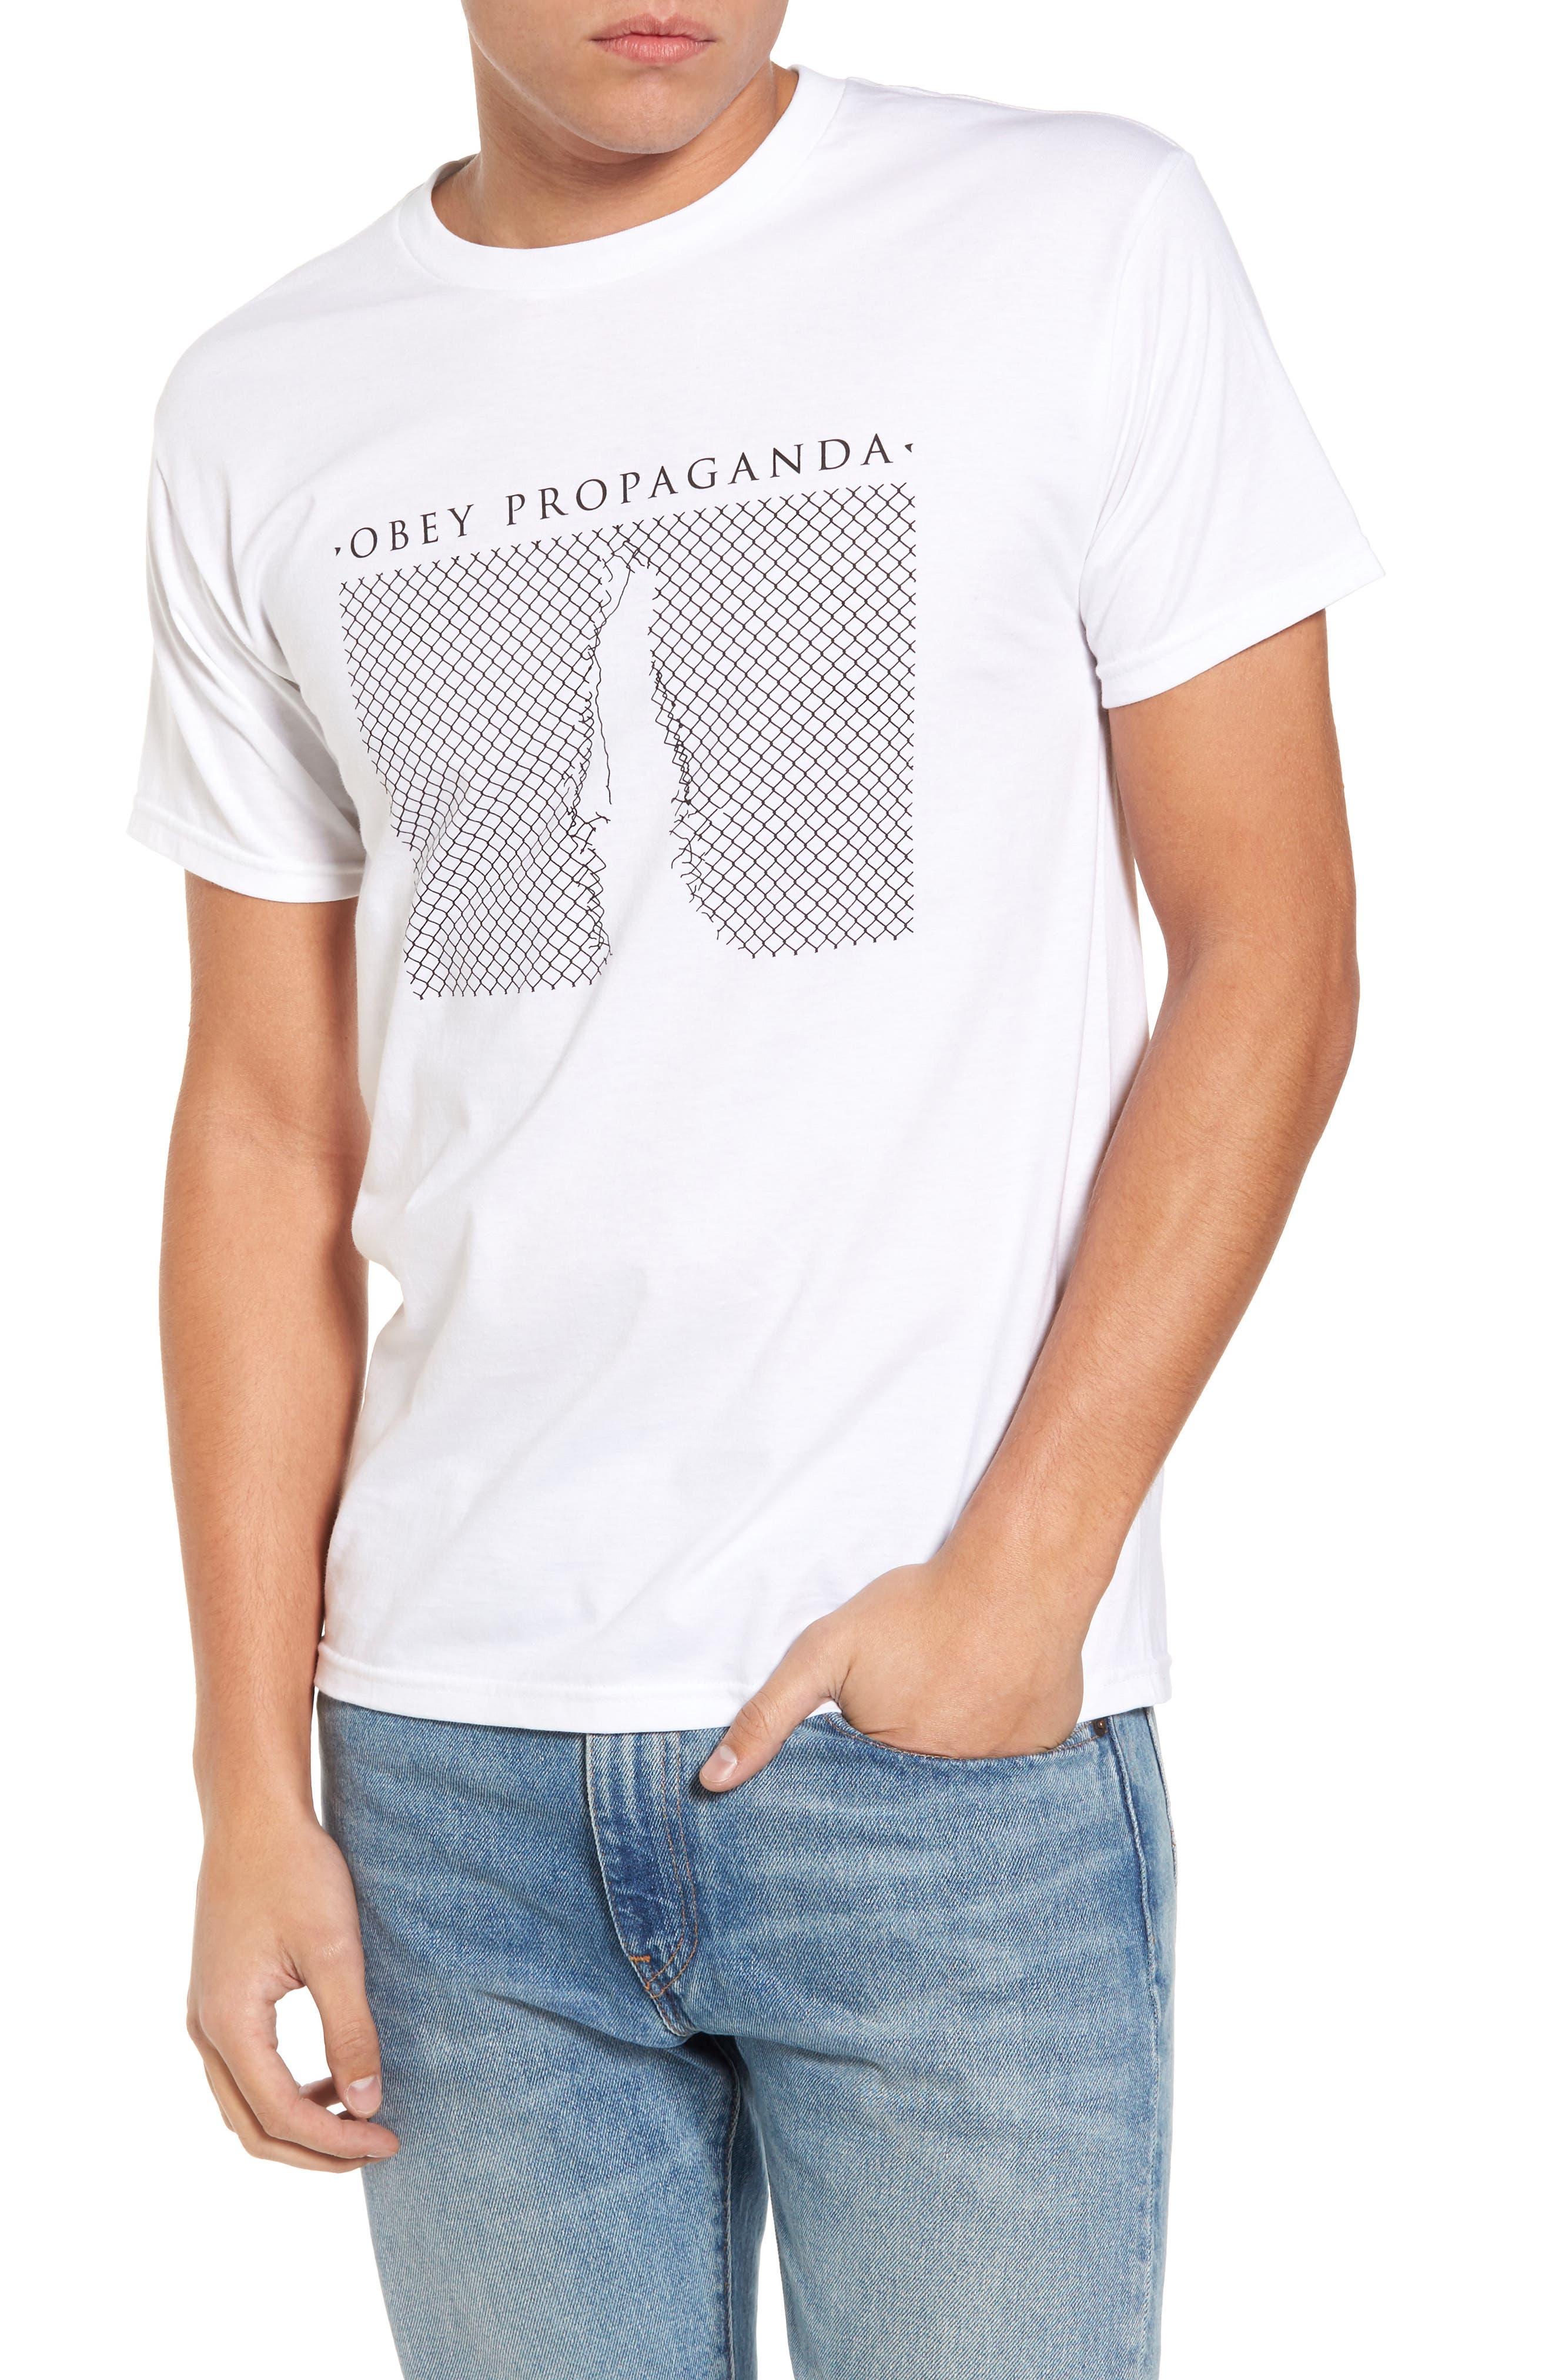 Obey VIP Premium T-Shirt